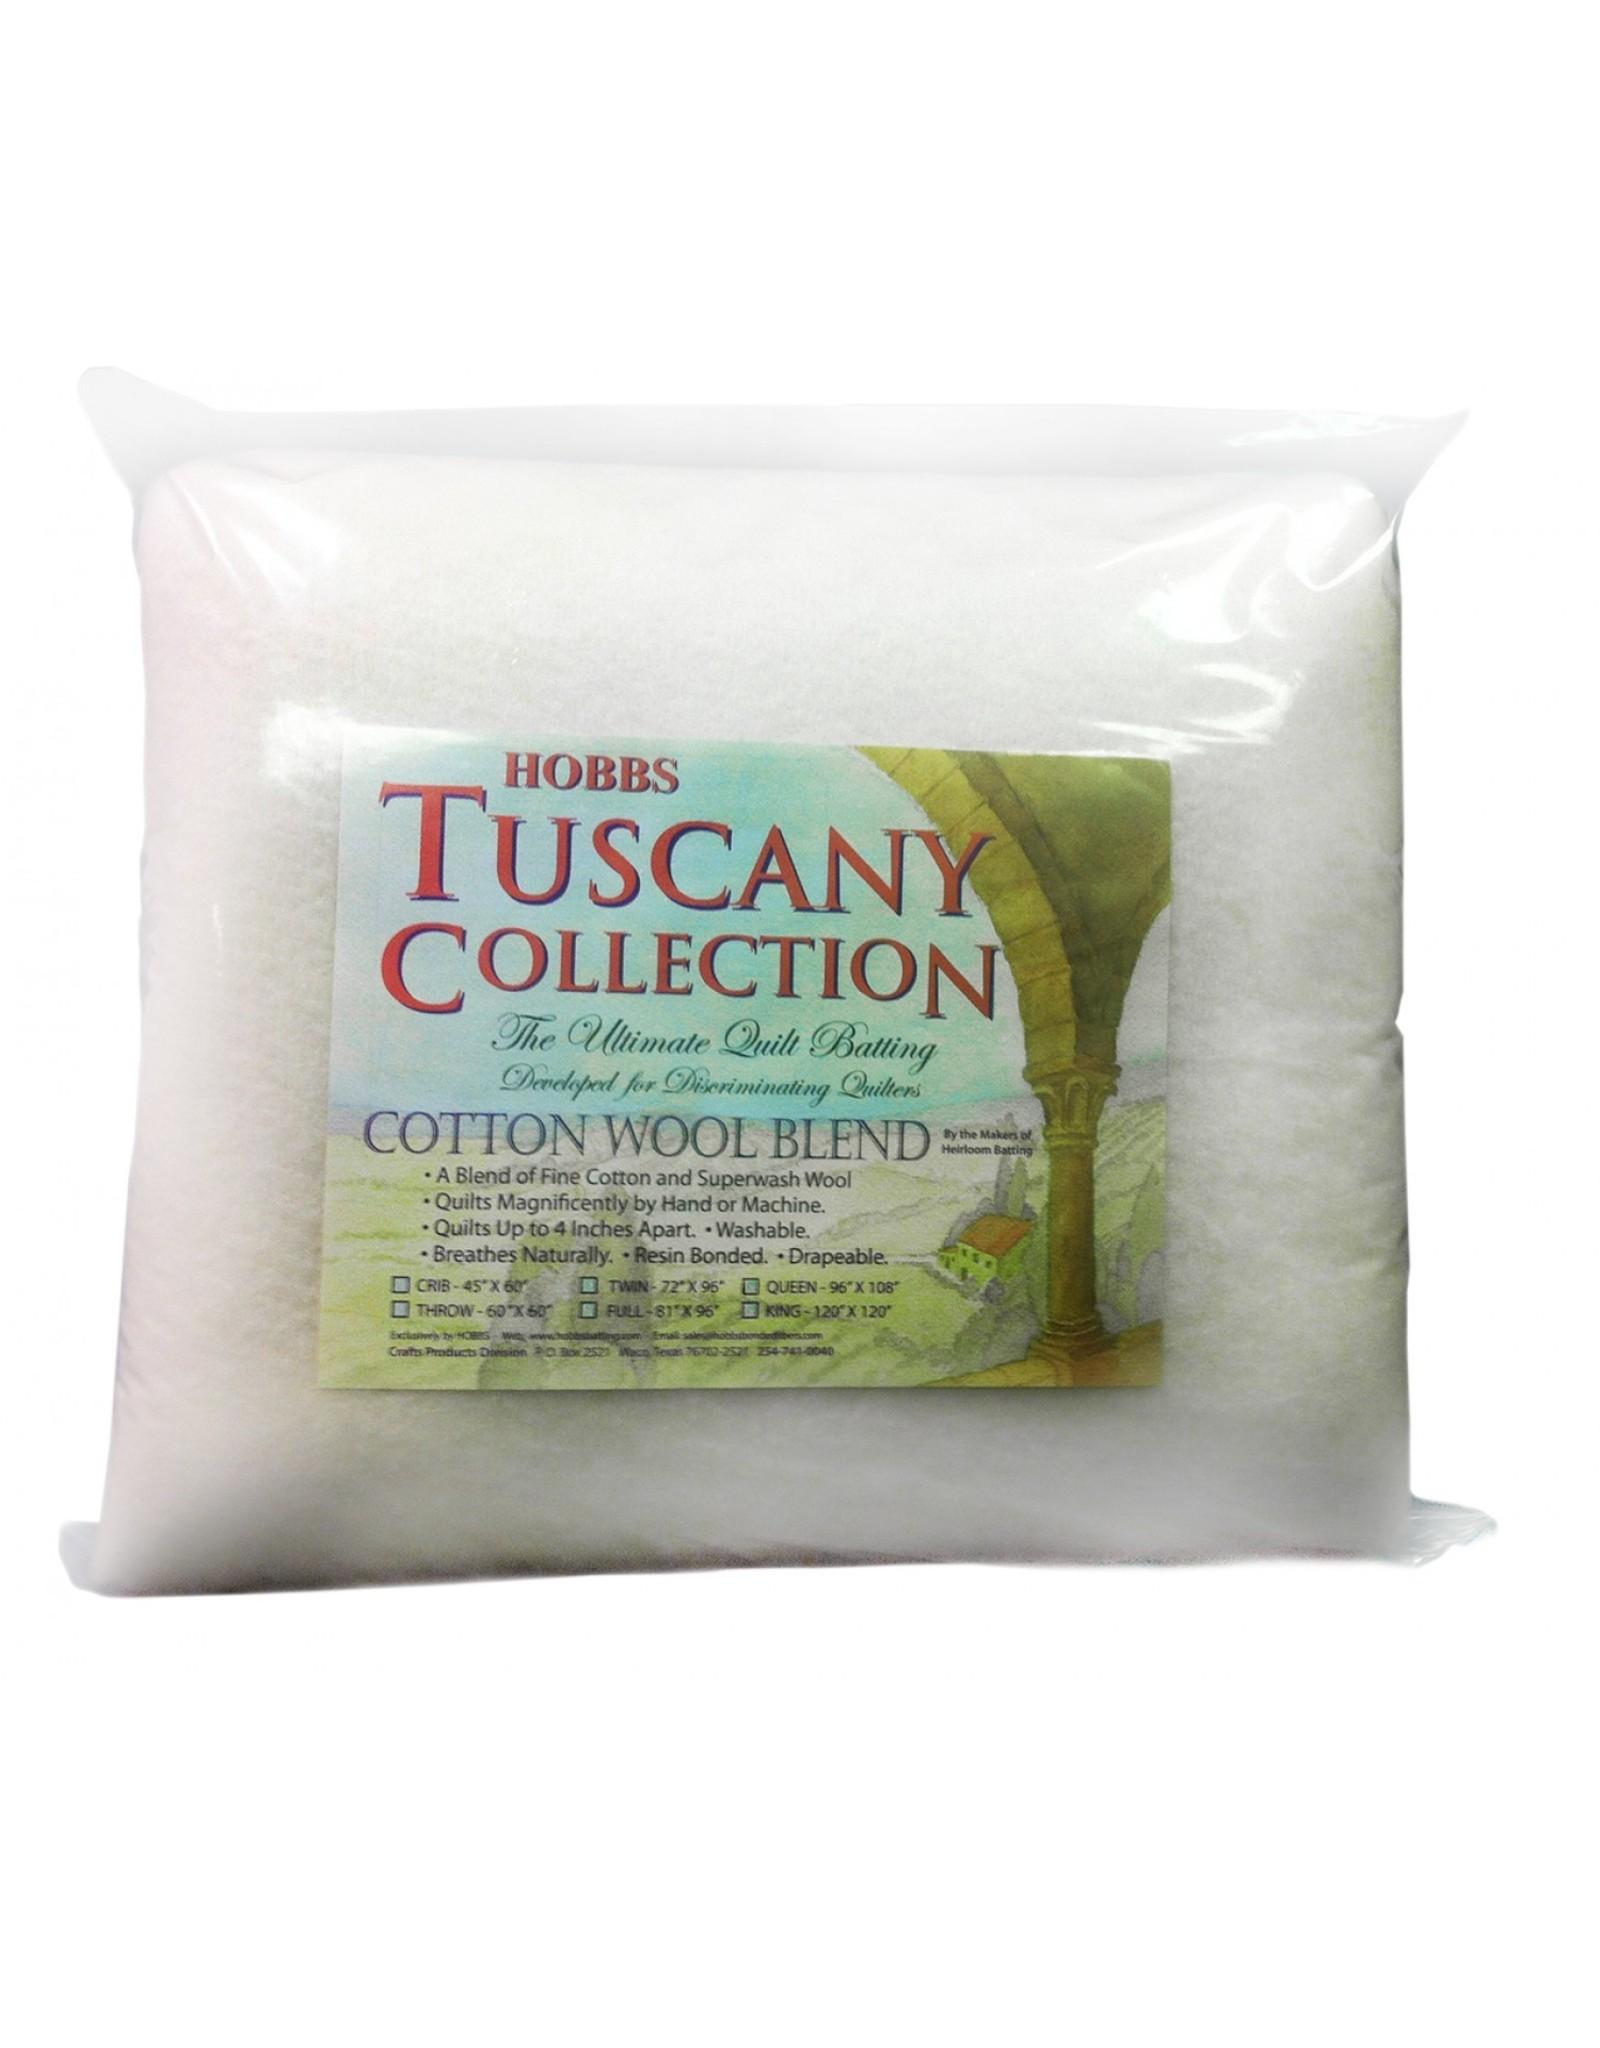 Hobbs Tuscany - Cotton / Wool - King - 304 x 304 cm